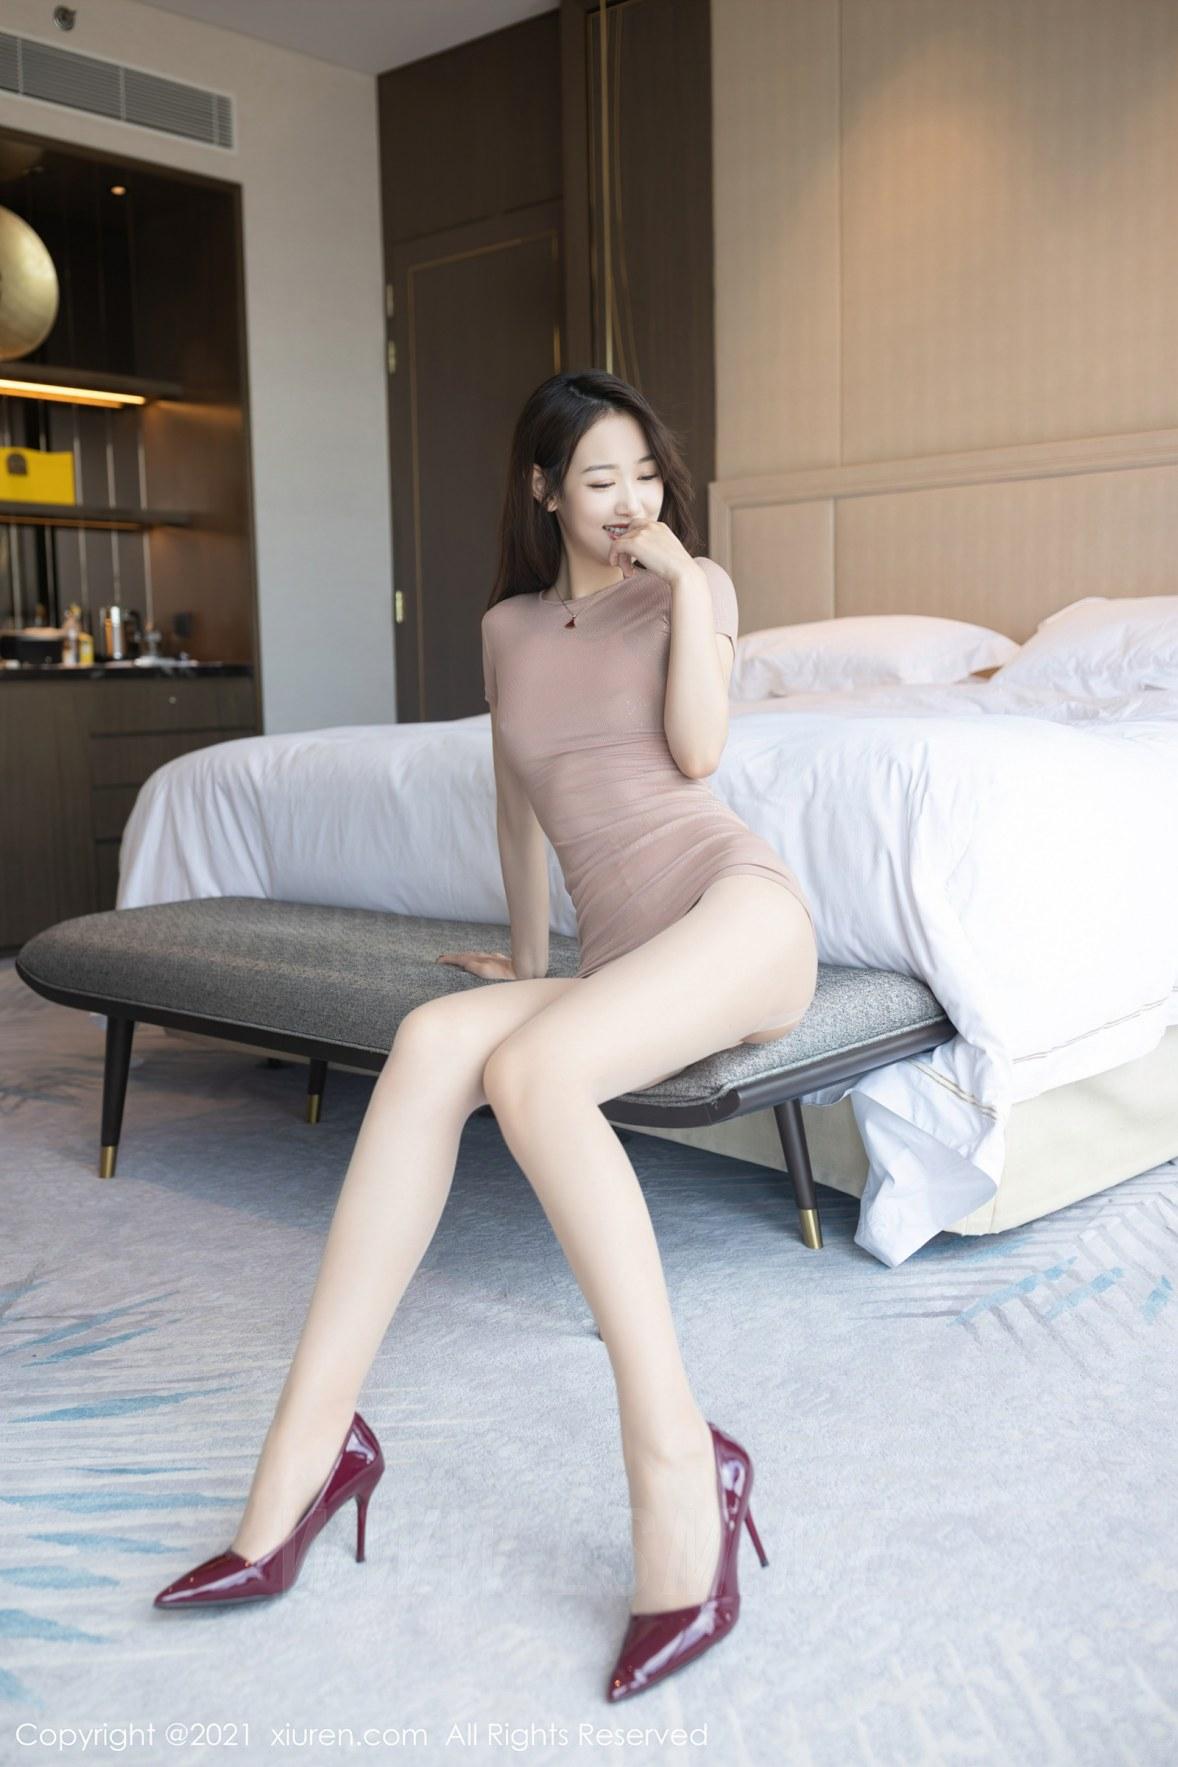 3780 030 8vl 3600 5400 - XiuRen 秀人 No.3780 裸色裙主题系列 唐安琪 澳门旅拍写真22 - 秀人网 -【免费在线写真】【丽人丝语】